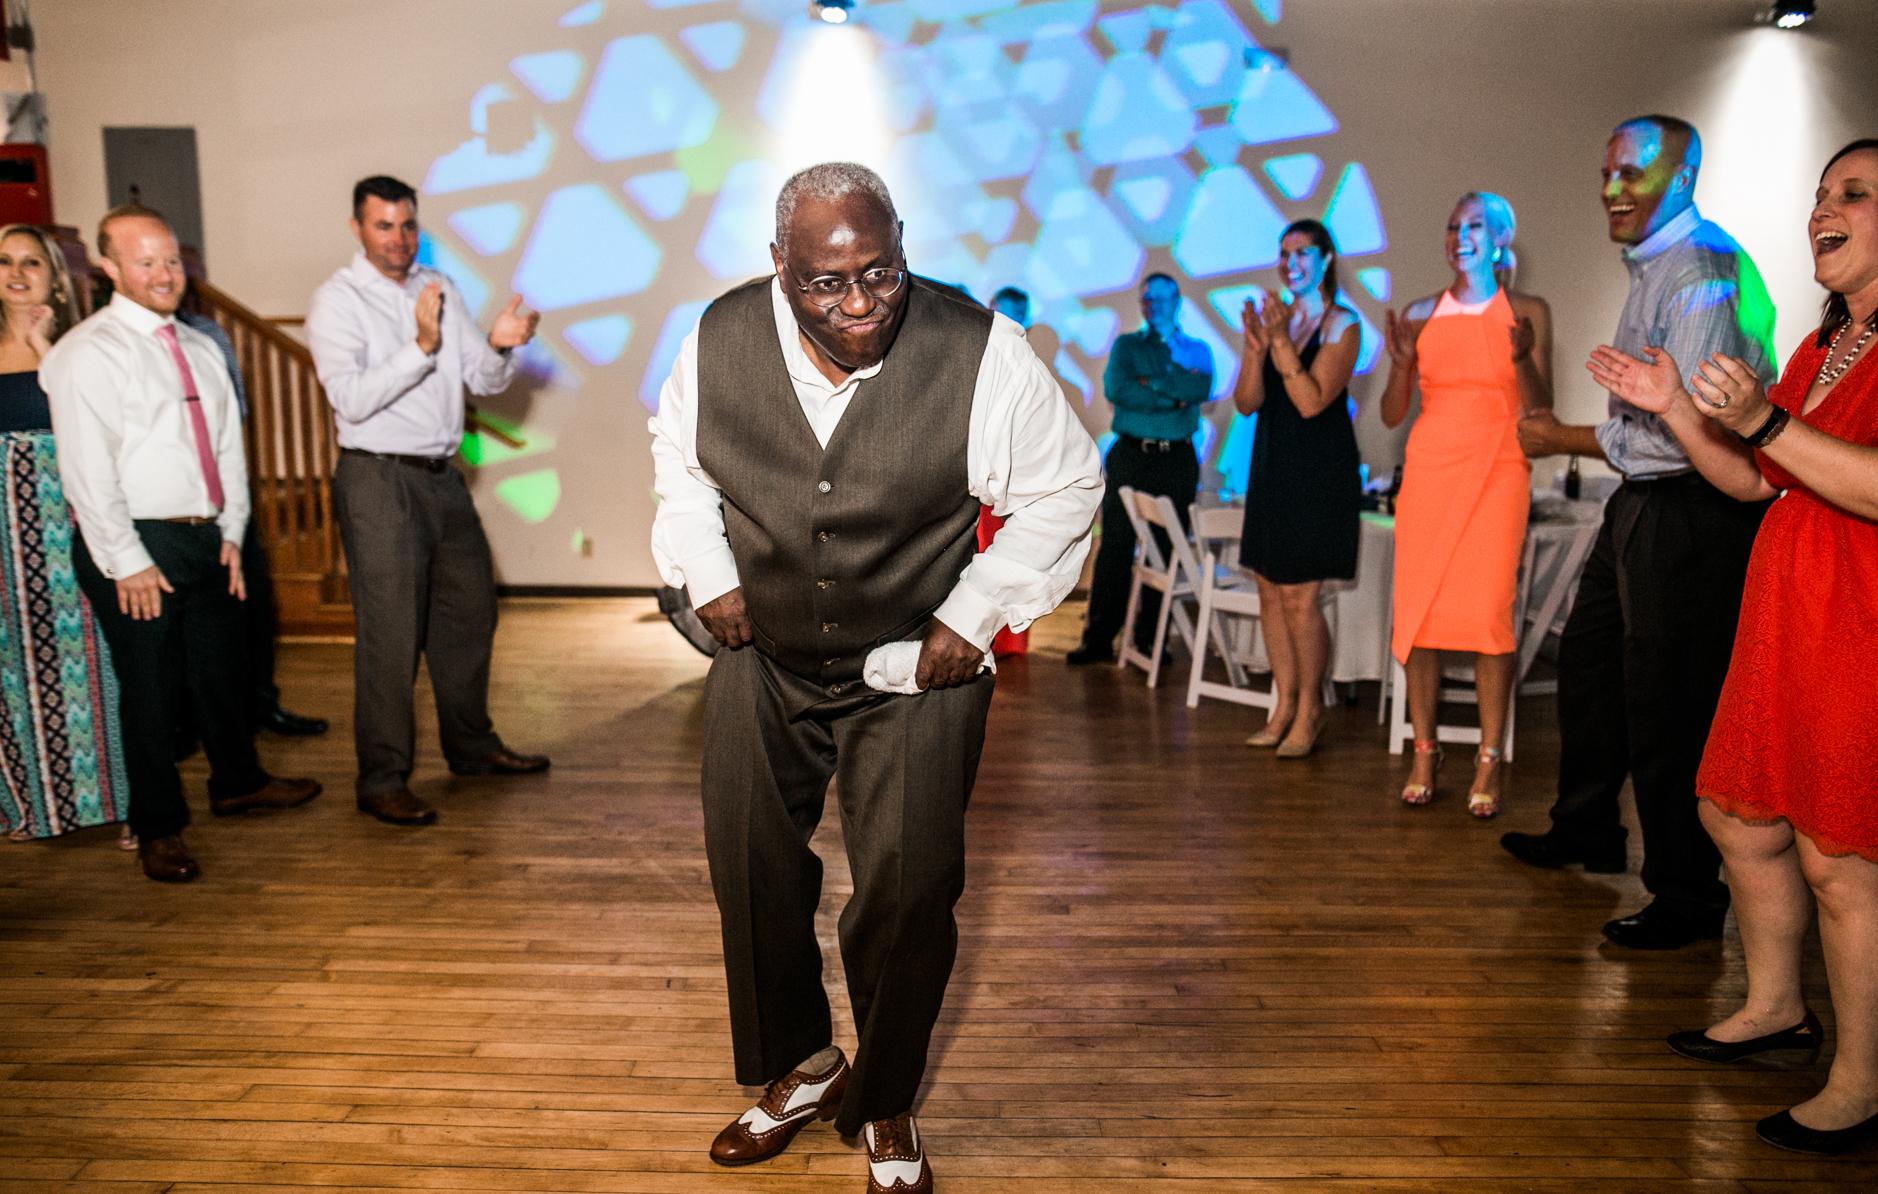 LegacyUnion-Wedding-Photographer-Glendale-CA-70.jpg